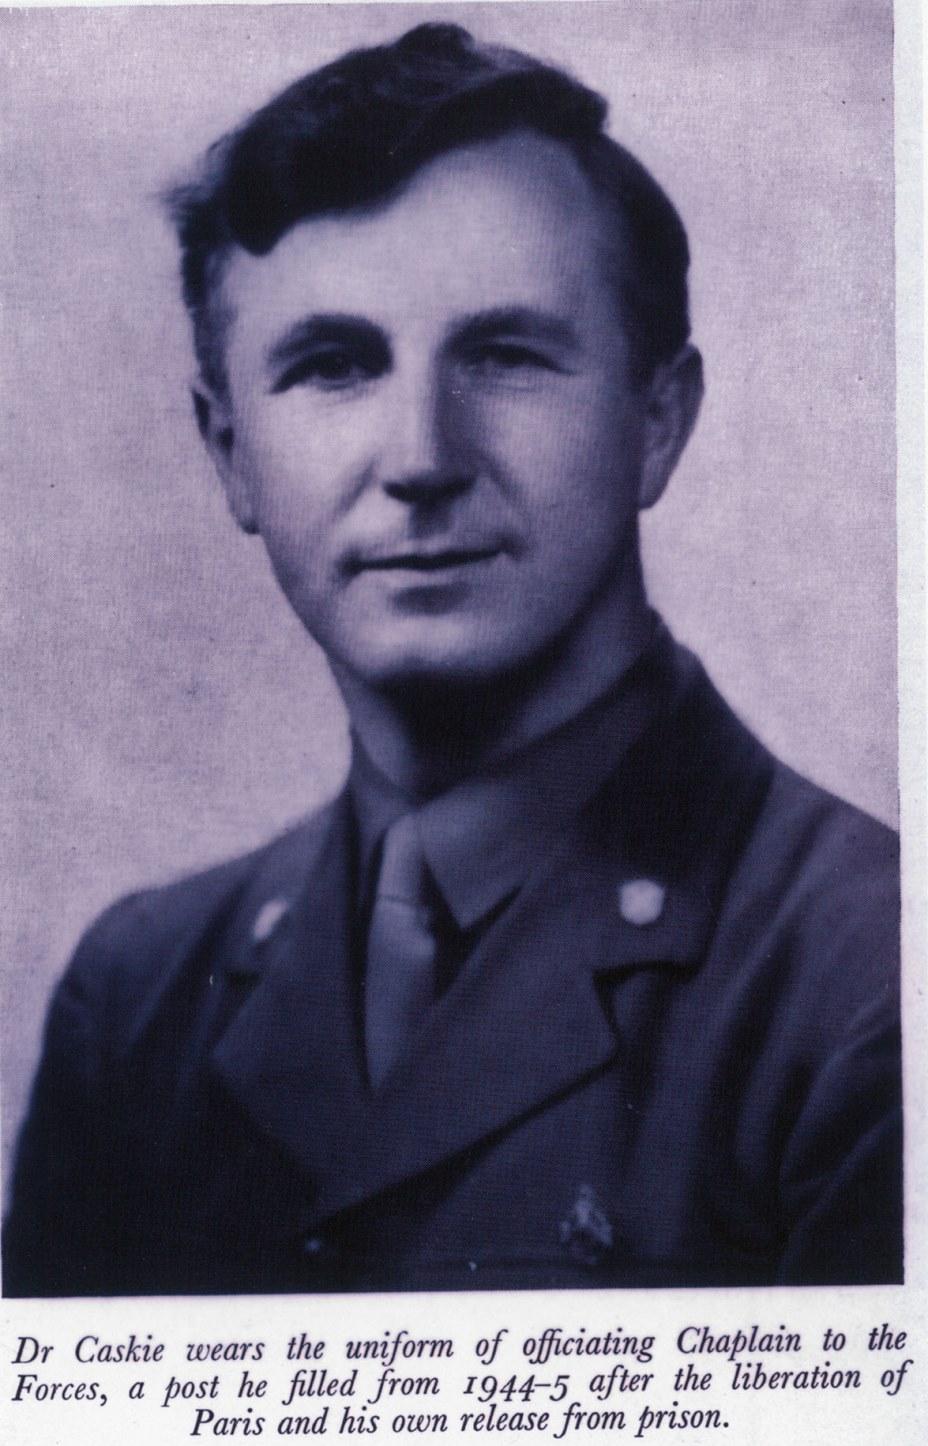 Rev Dr Donald Caskie